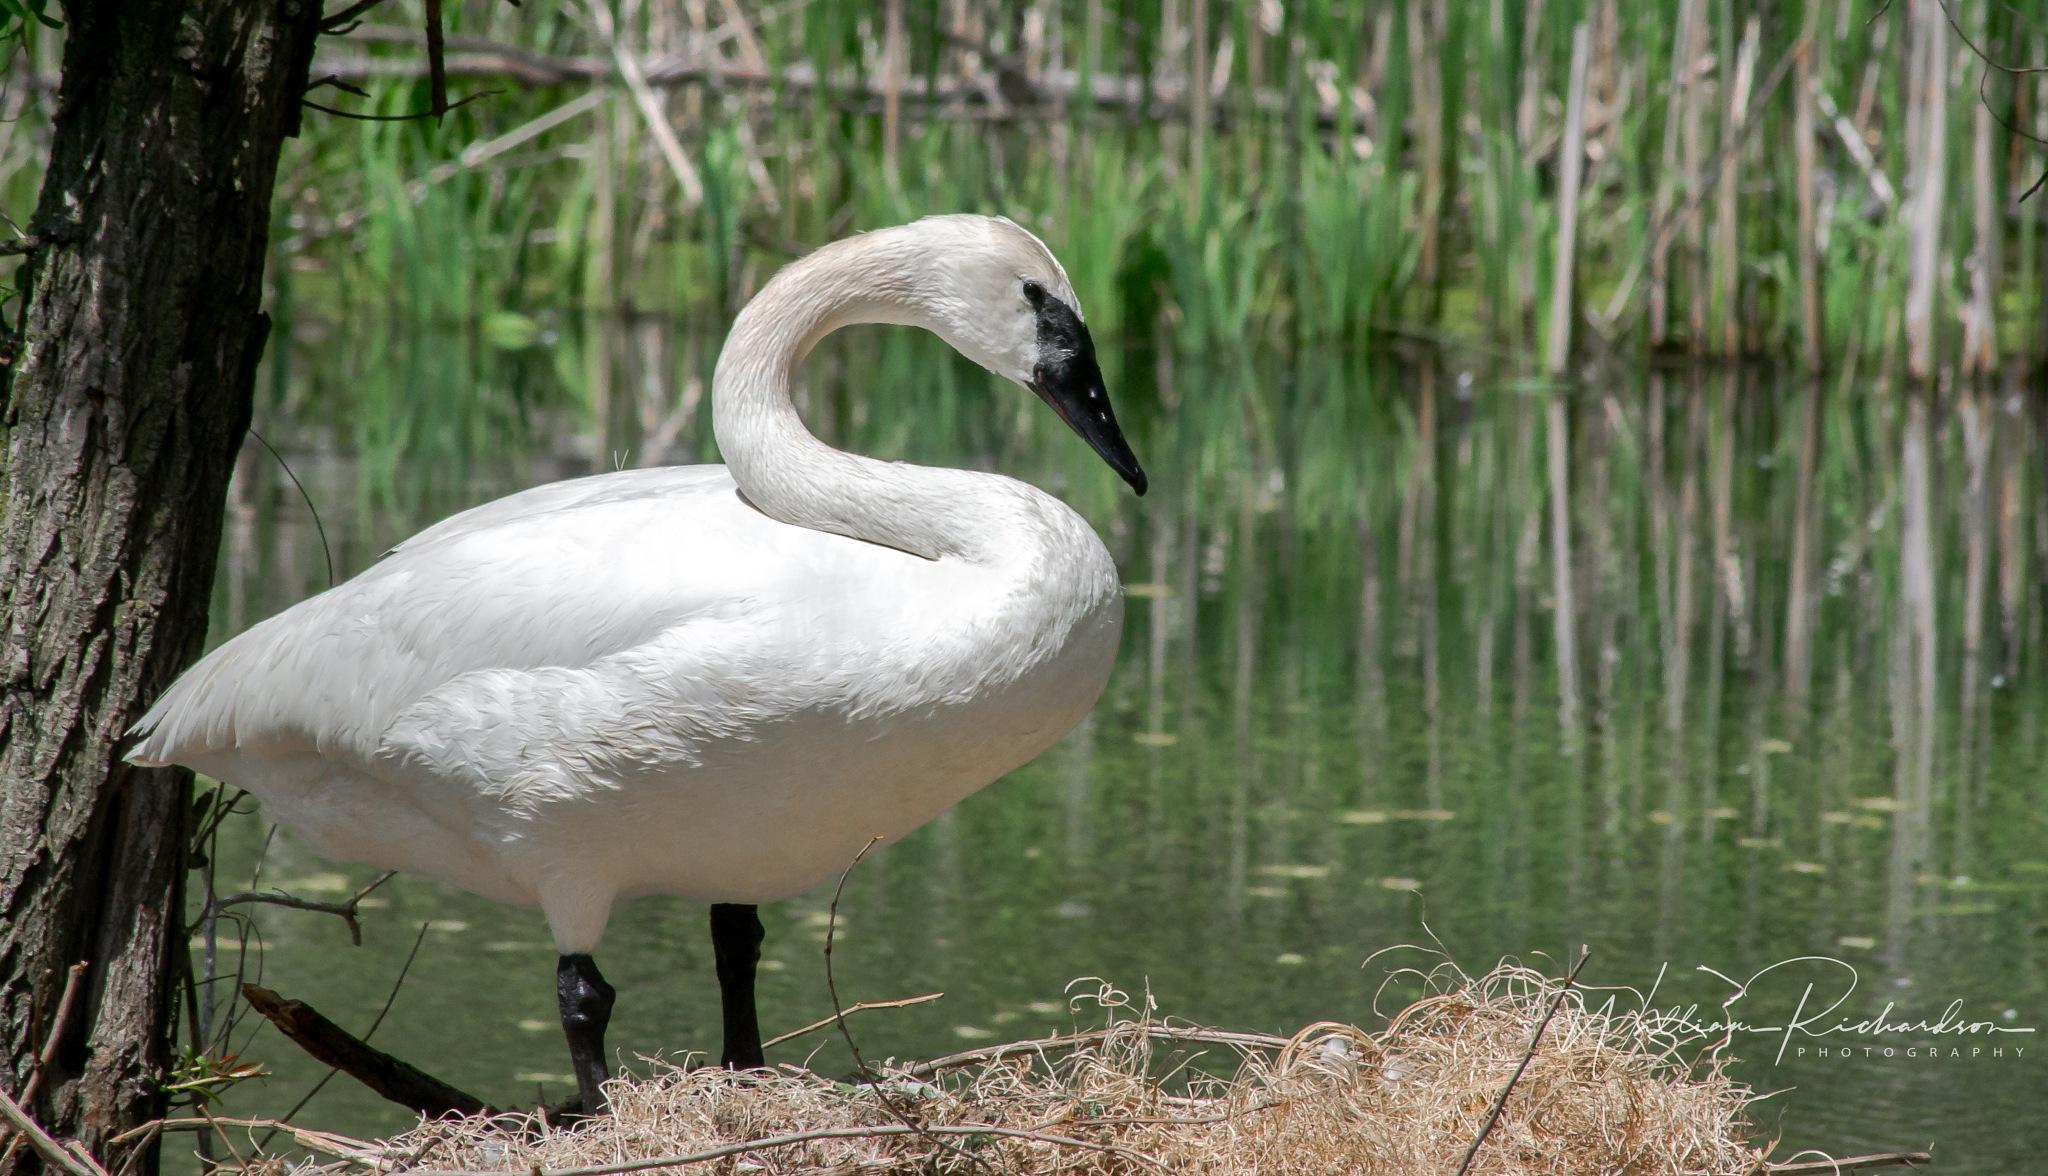 Swan by William Richardson